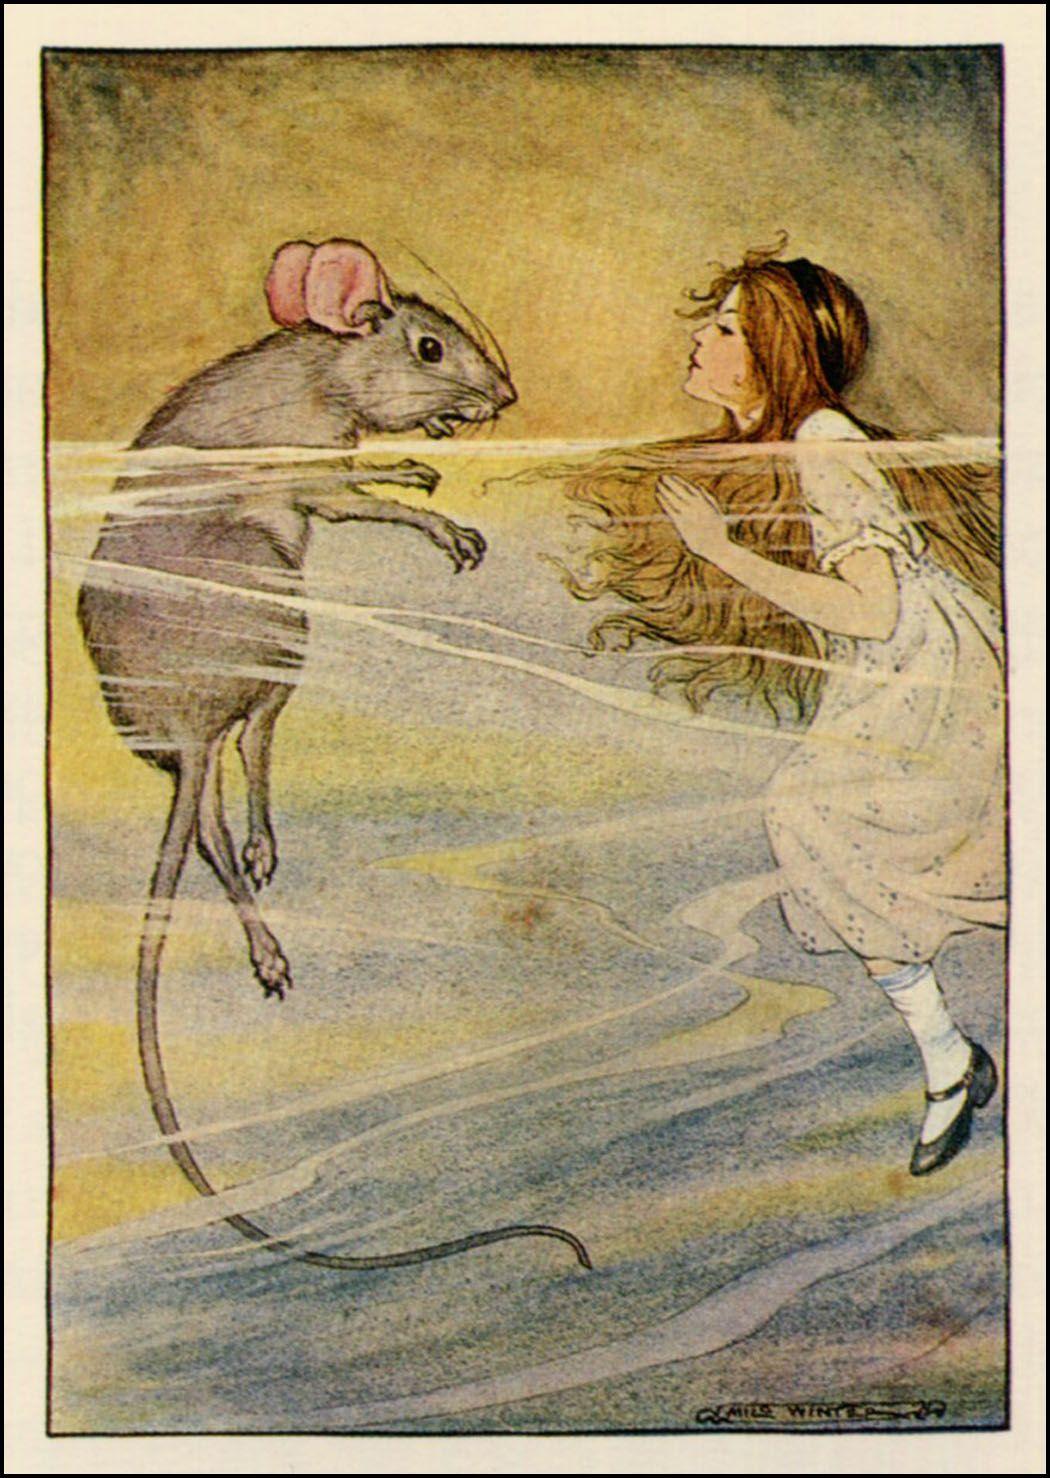 Milo Winter - Alice poo lof tears 1916